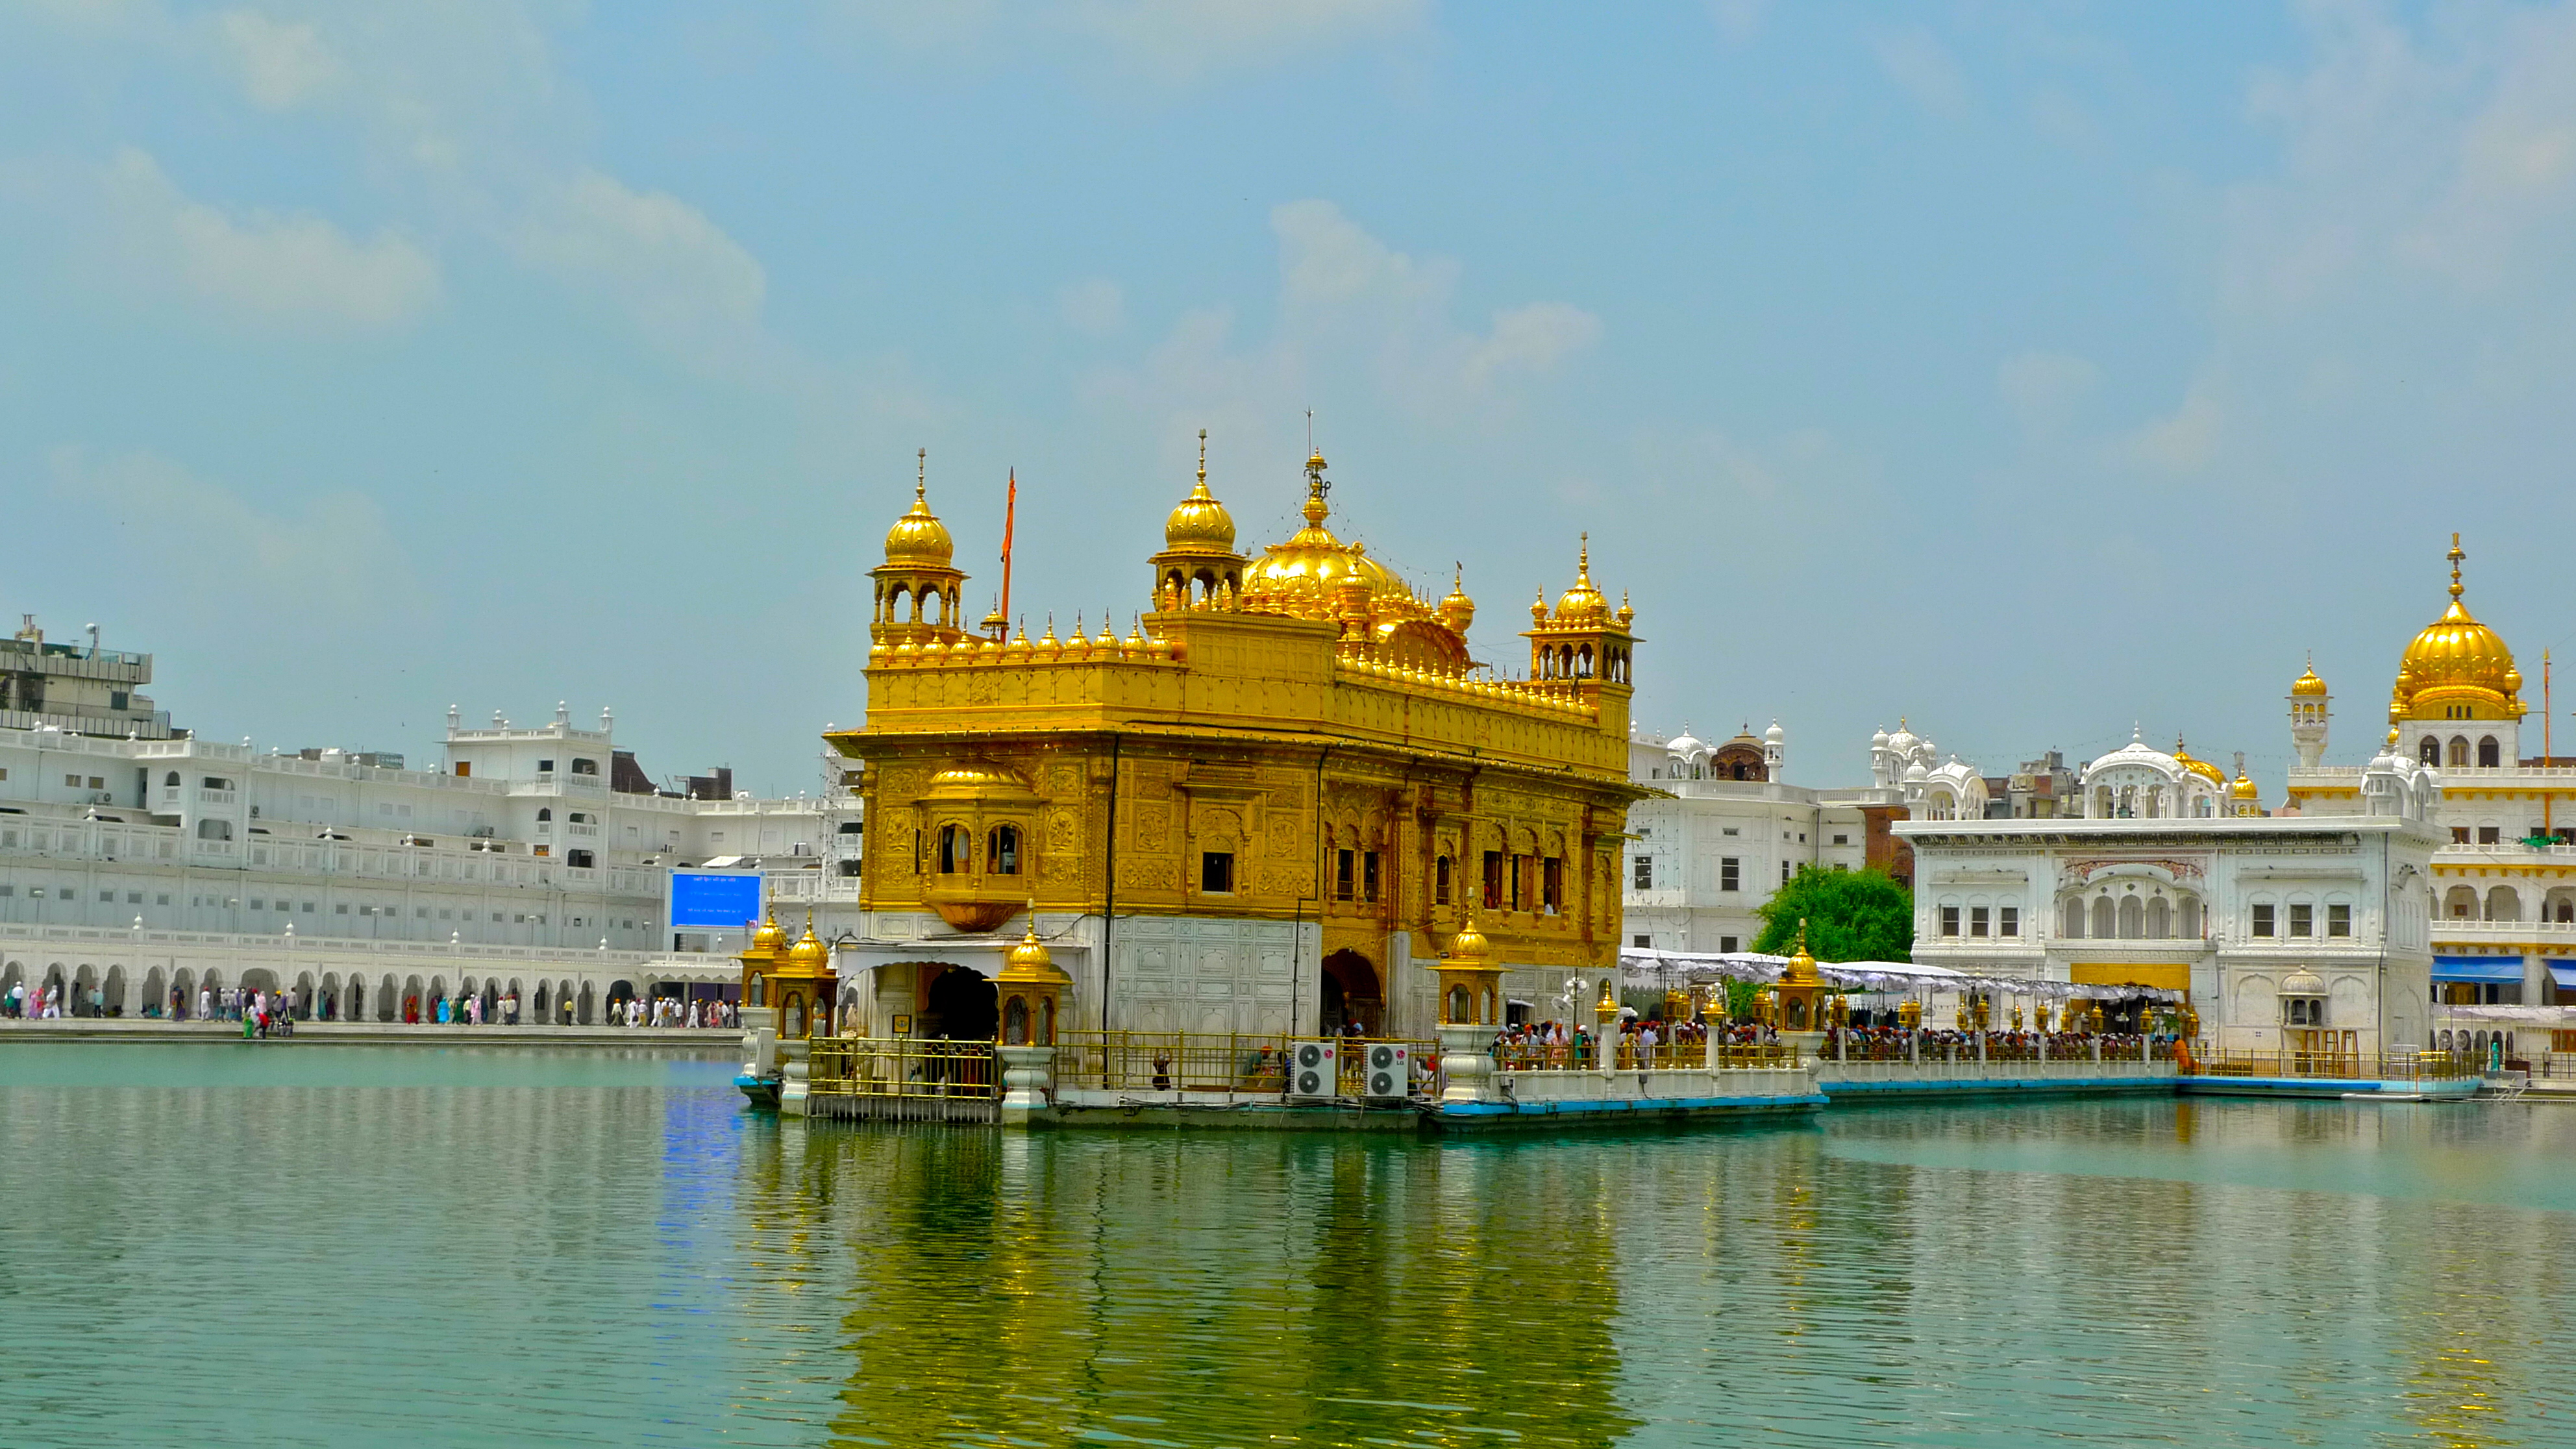 The Golden Temple, Amritsar « CraSh Williams' Blog